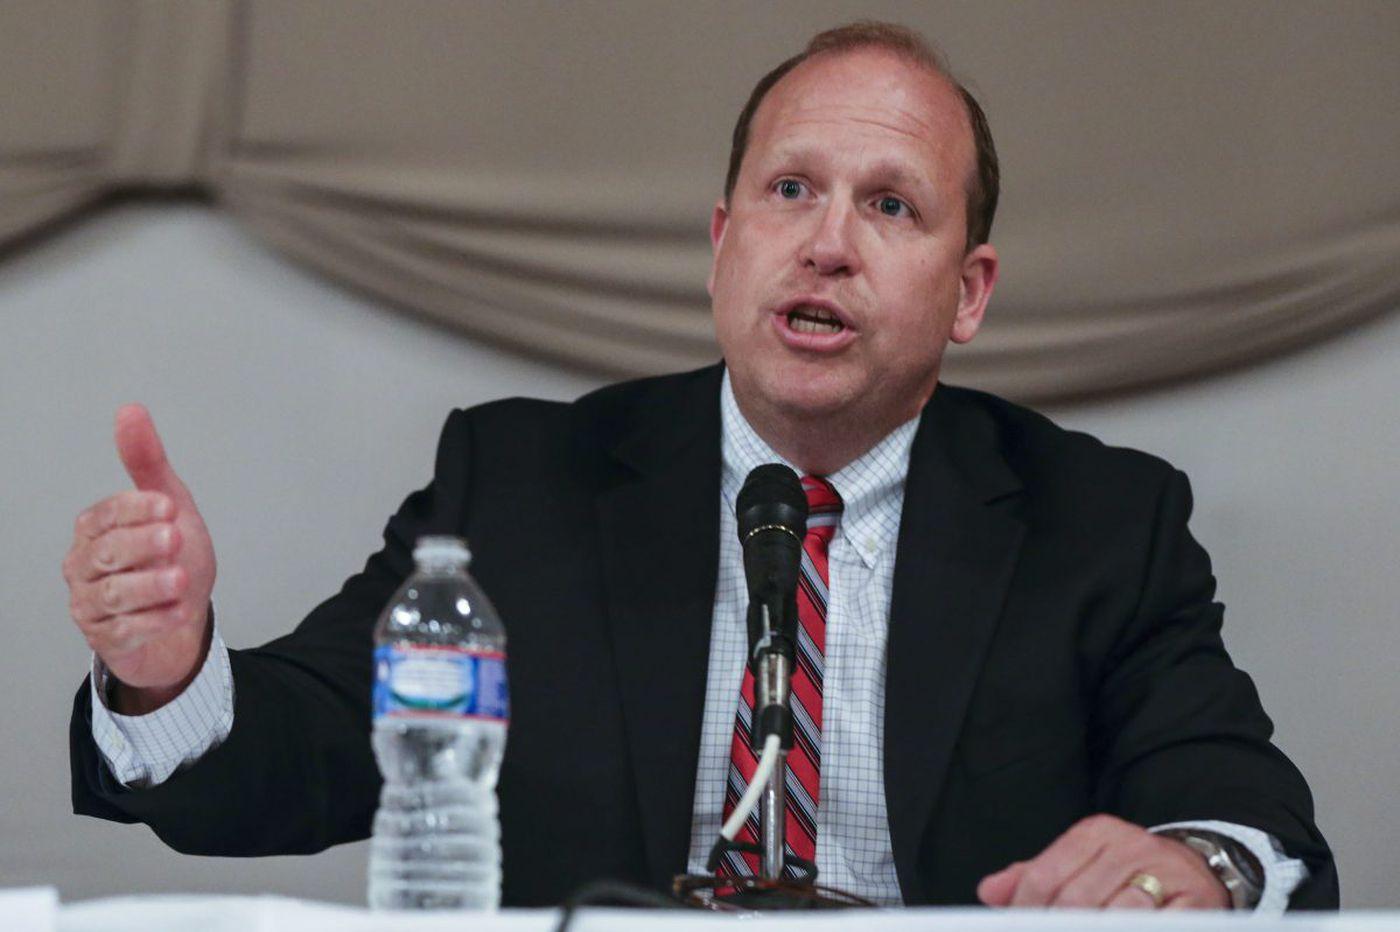 Dems jockey over new Montco congressional seat